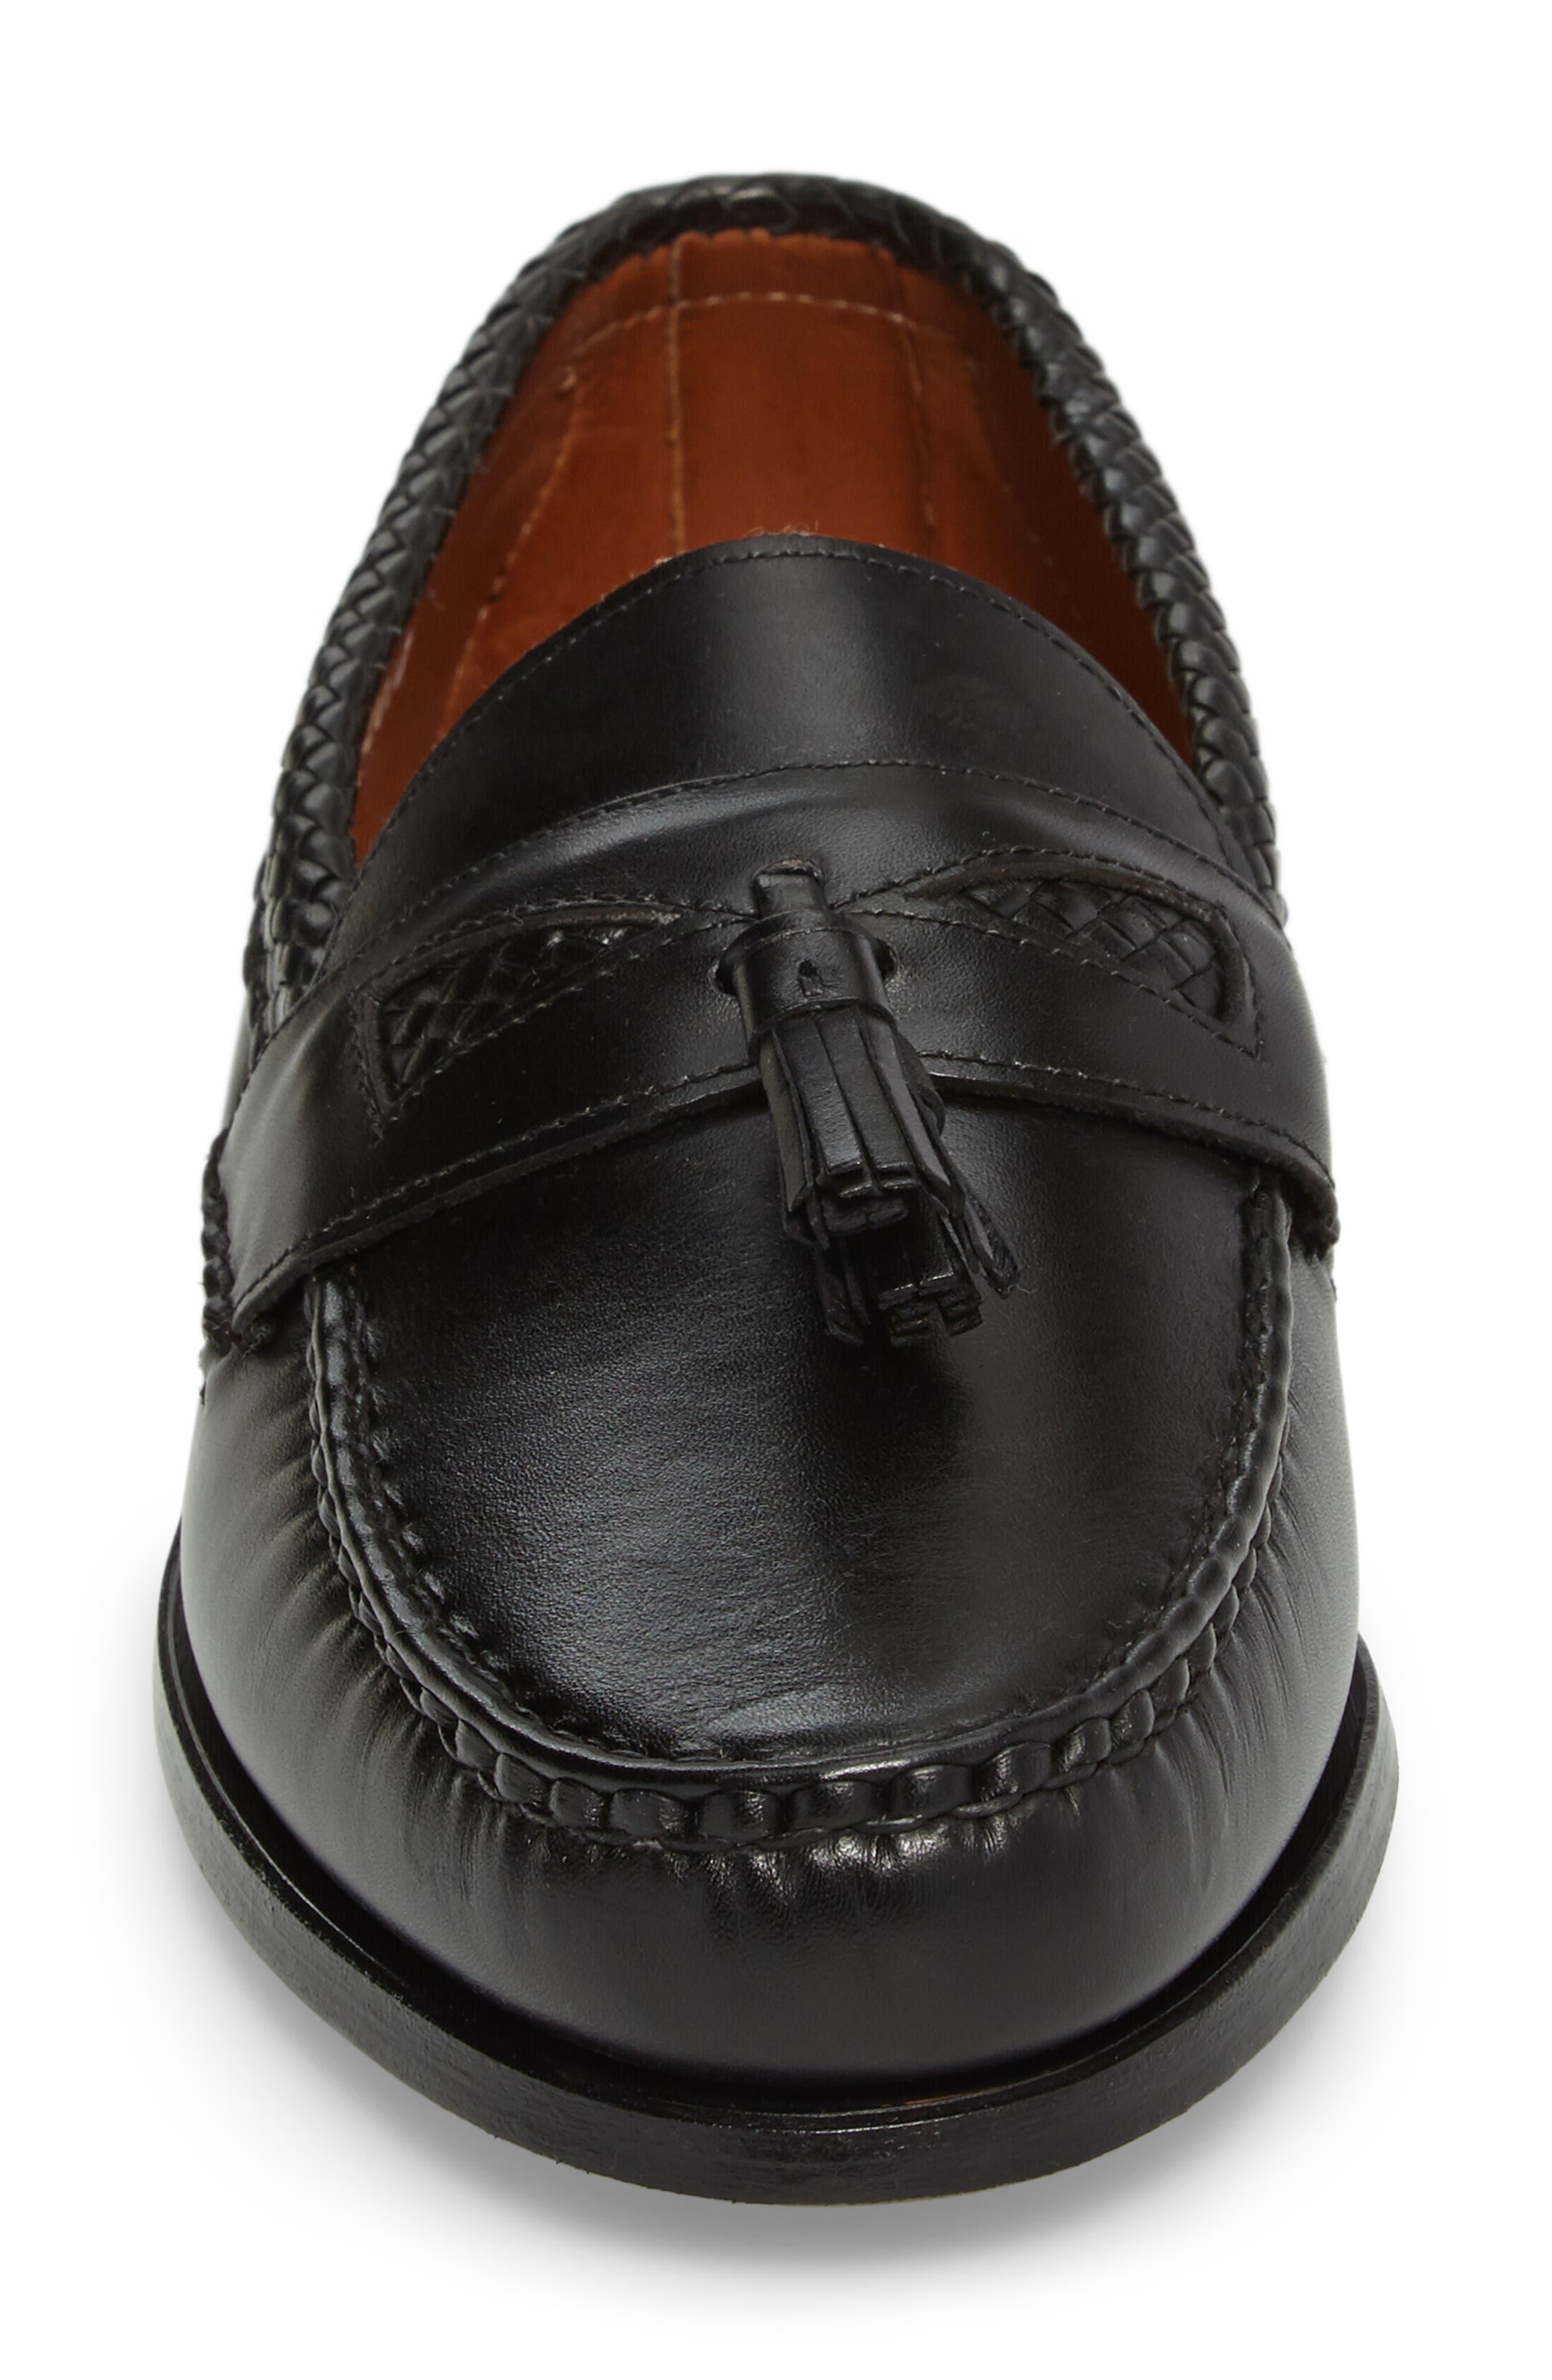 ALLEN EDMONDS, 'Maxfield' Loafer, Alternate thumbnail 4, color, BLACK